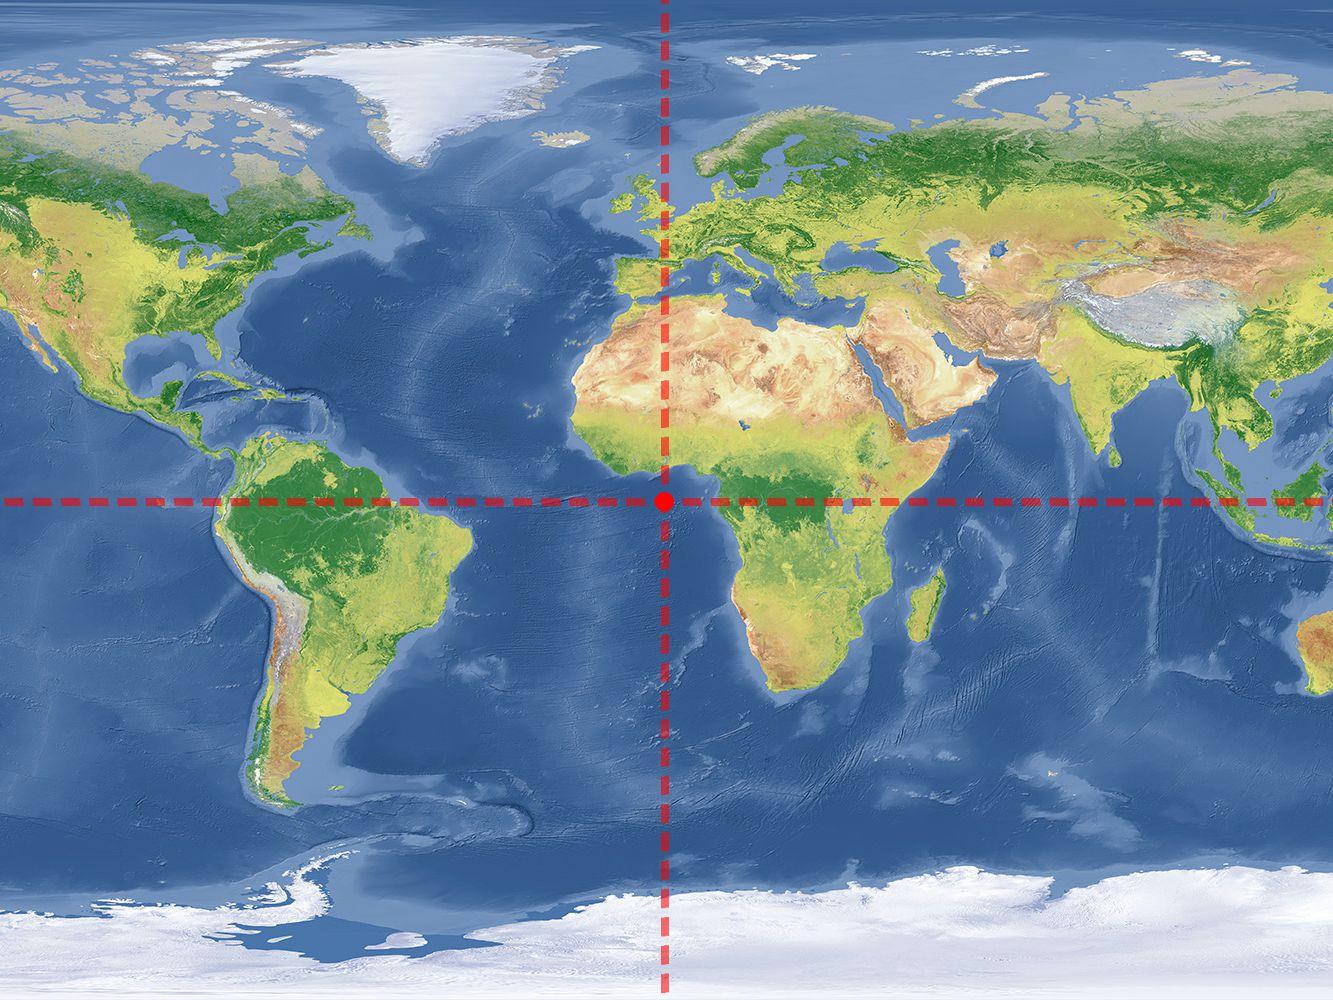 Where Do 0 Degrees Latitude And Longitude Intersect